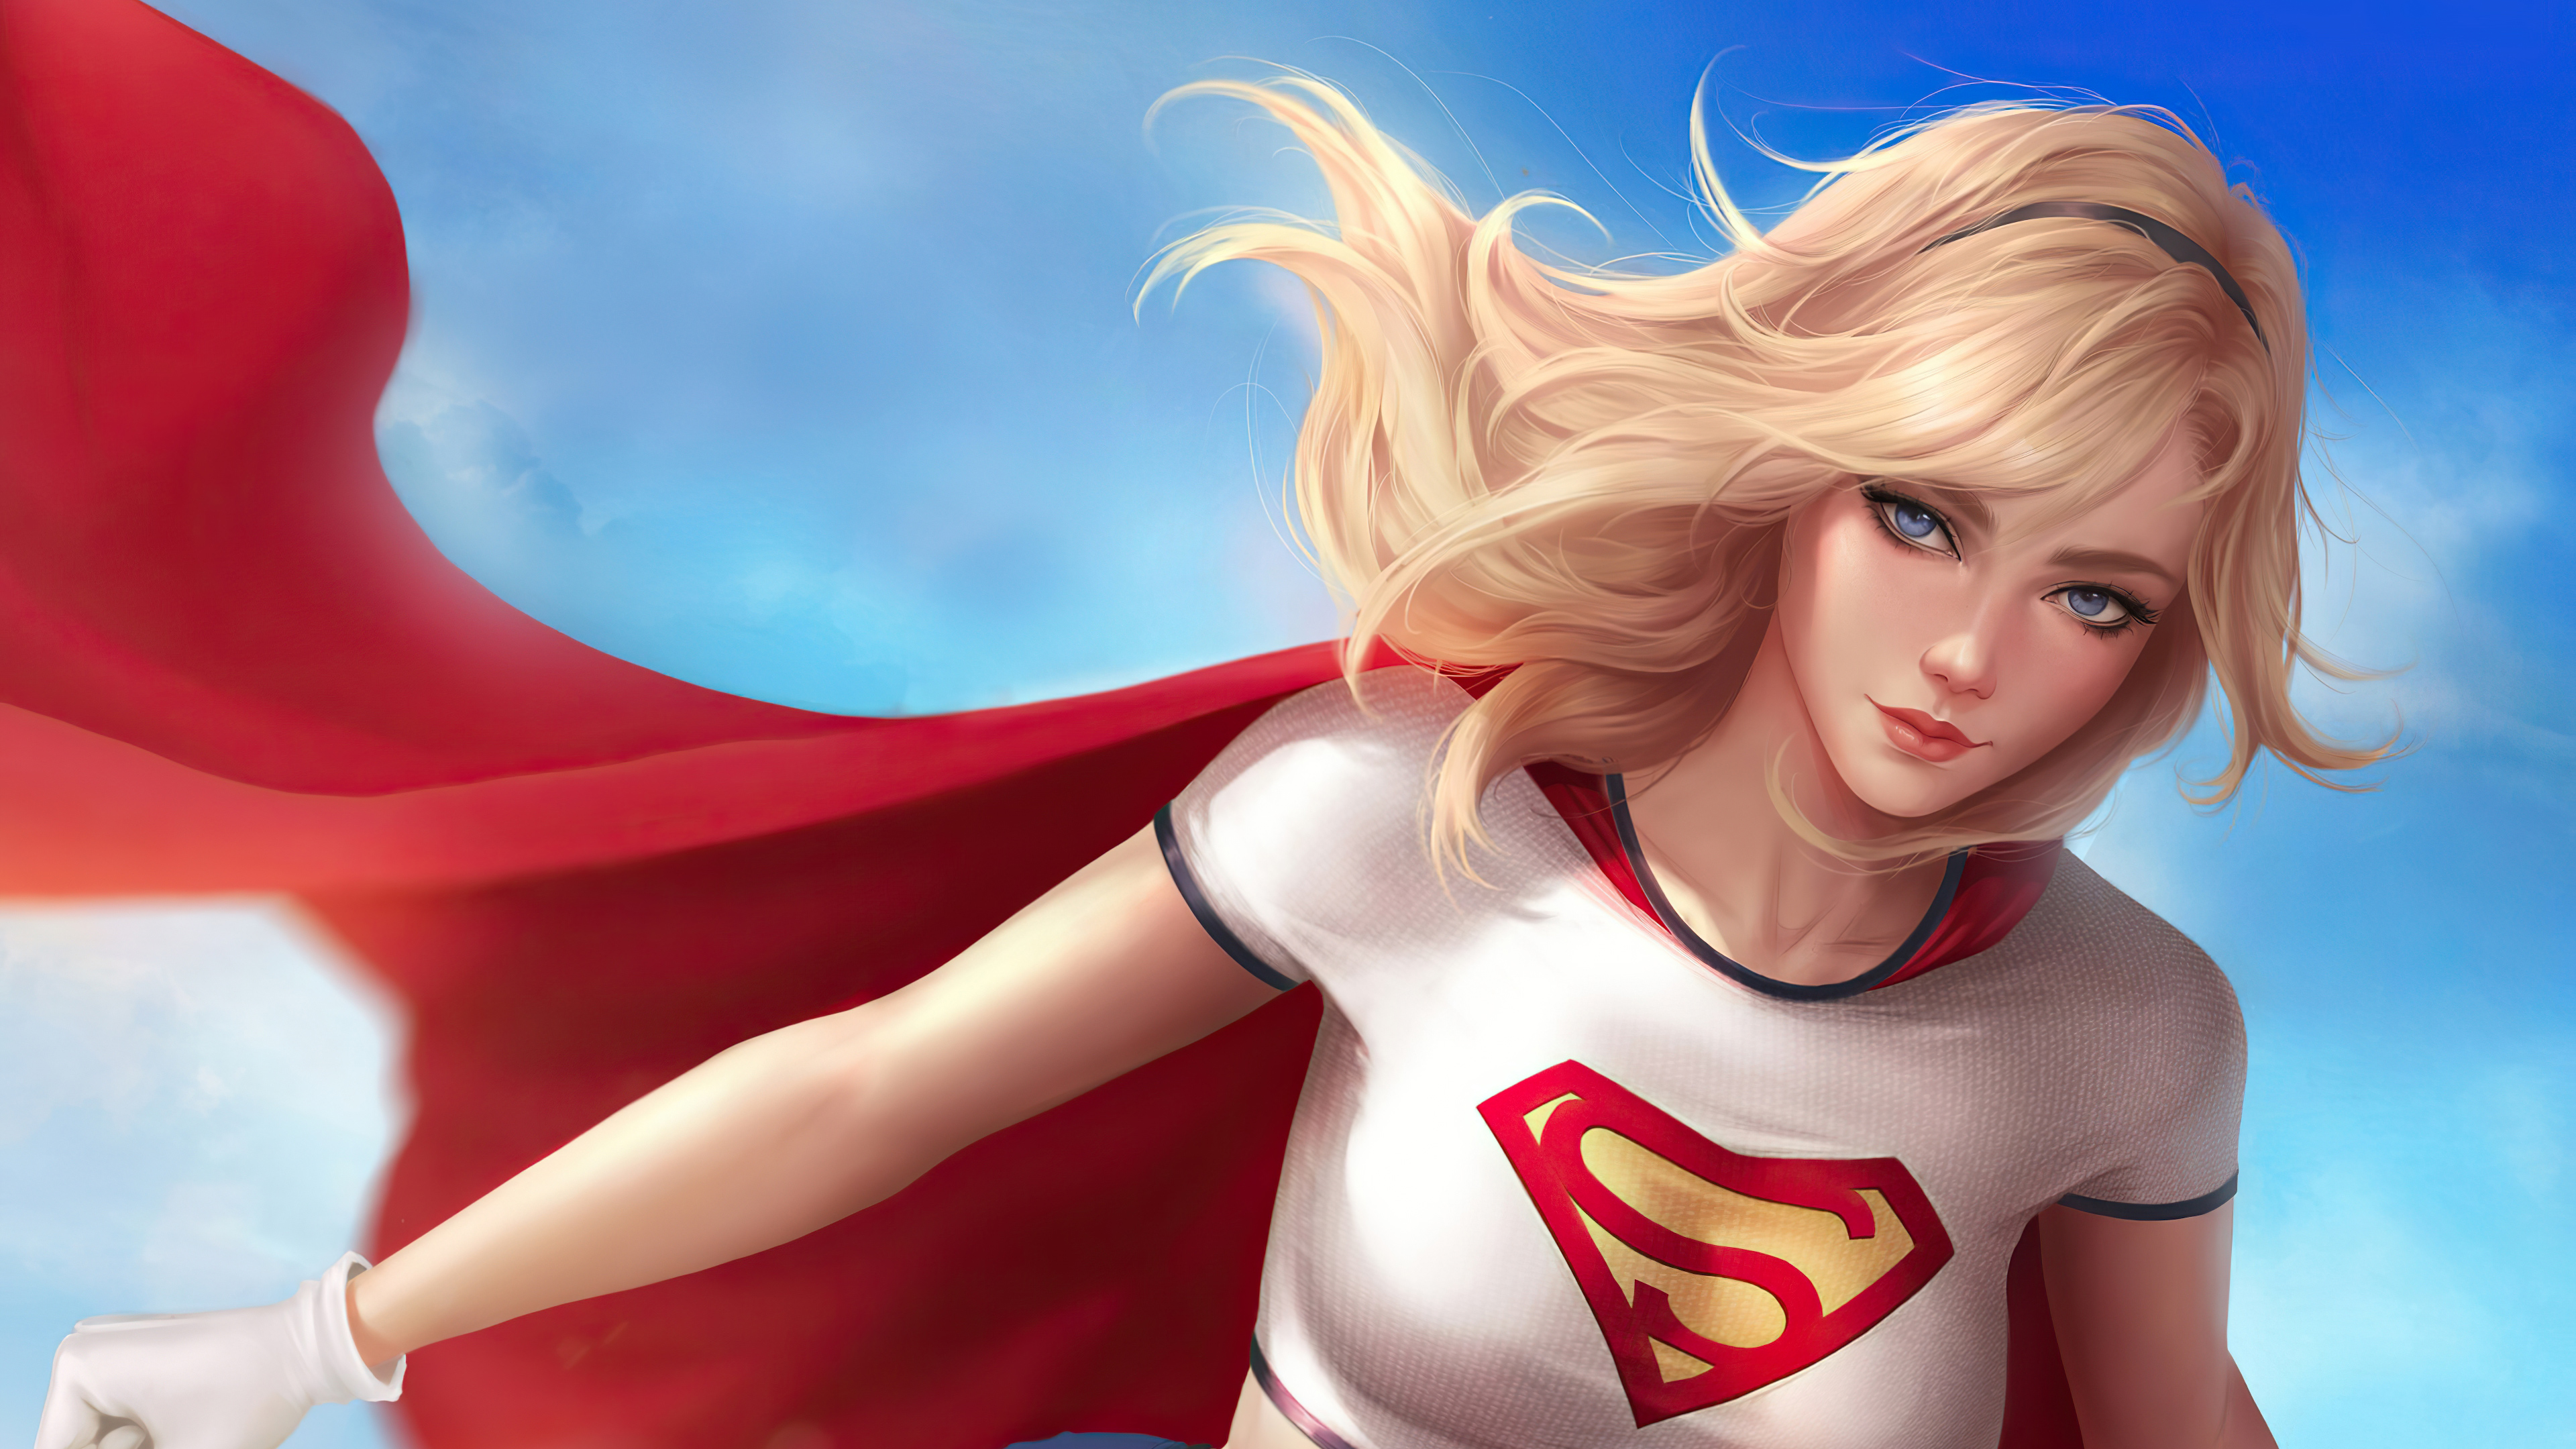 Fondos de pantalla Supergirl Artwork 2020